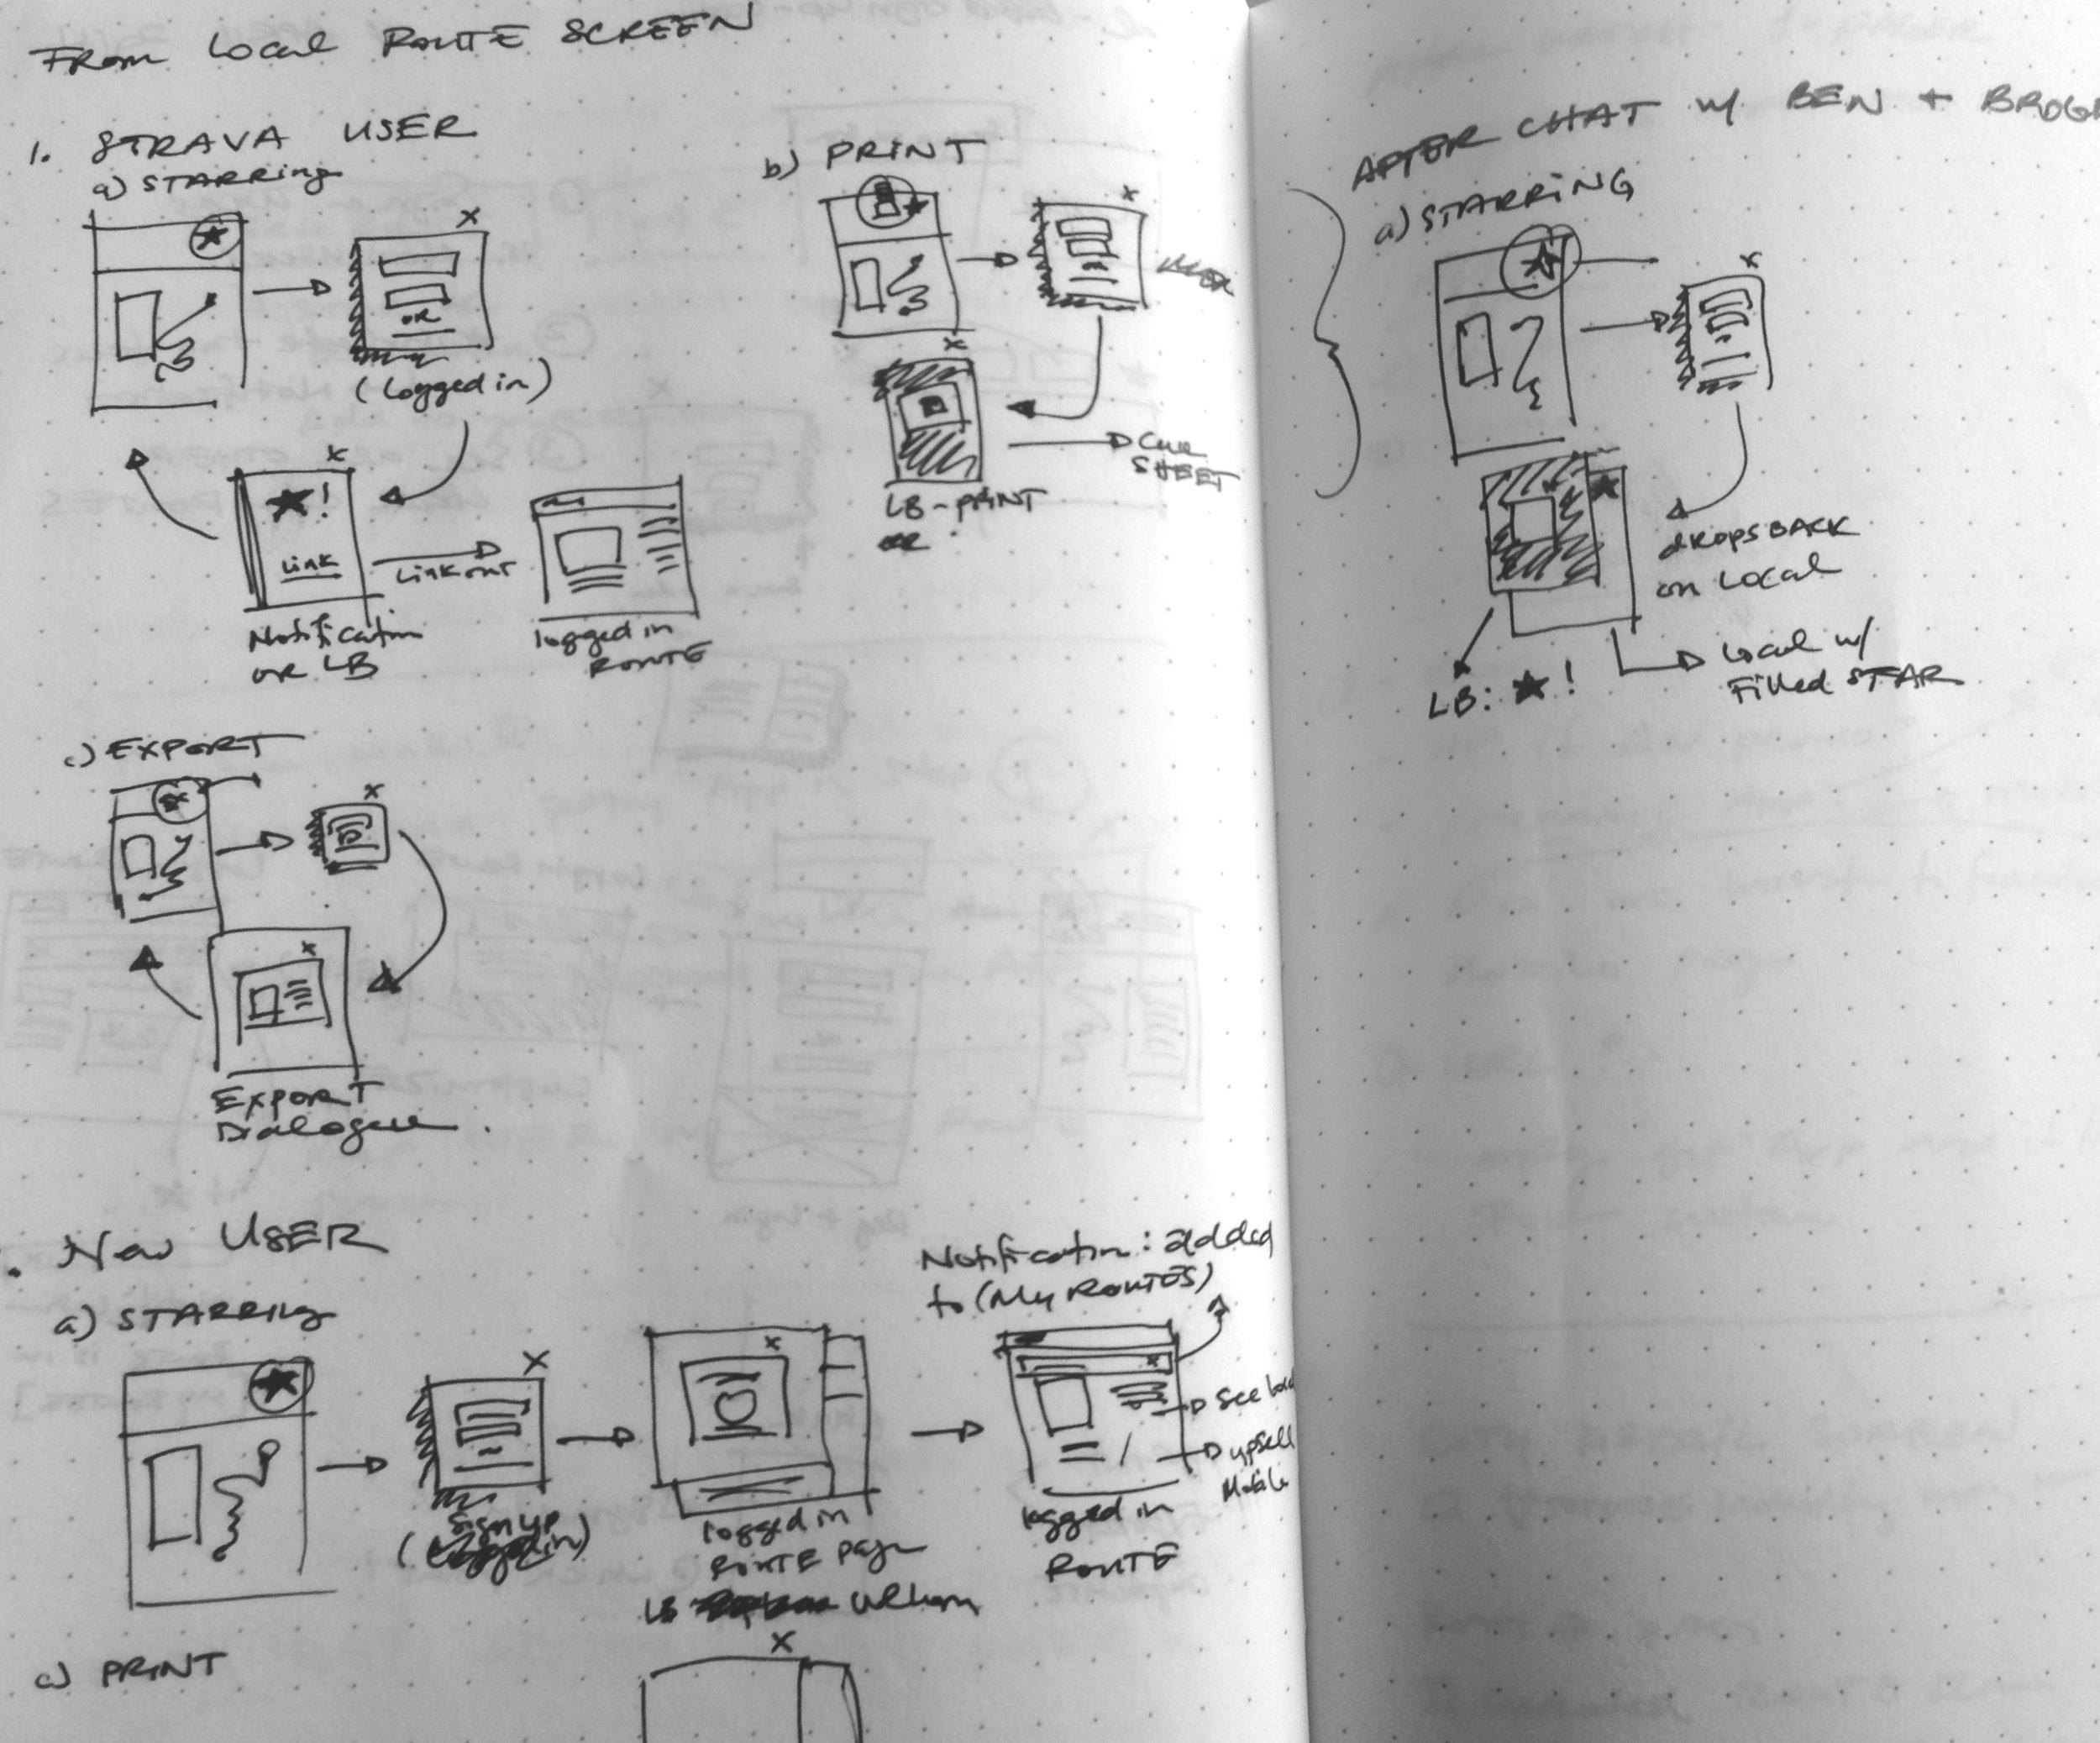 use-case-flows-logging-into-strava.jpg